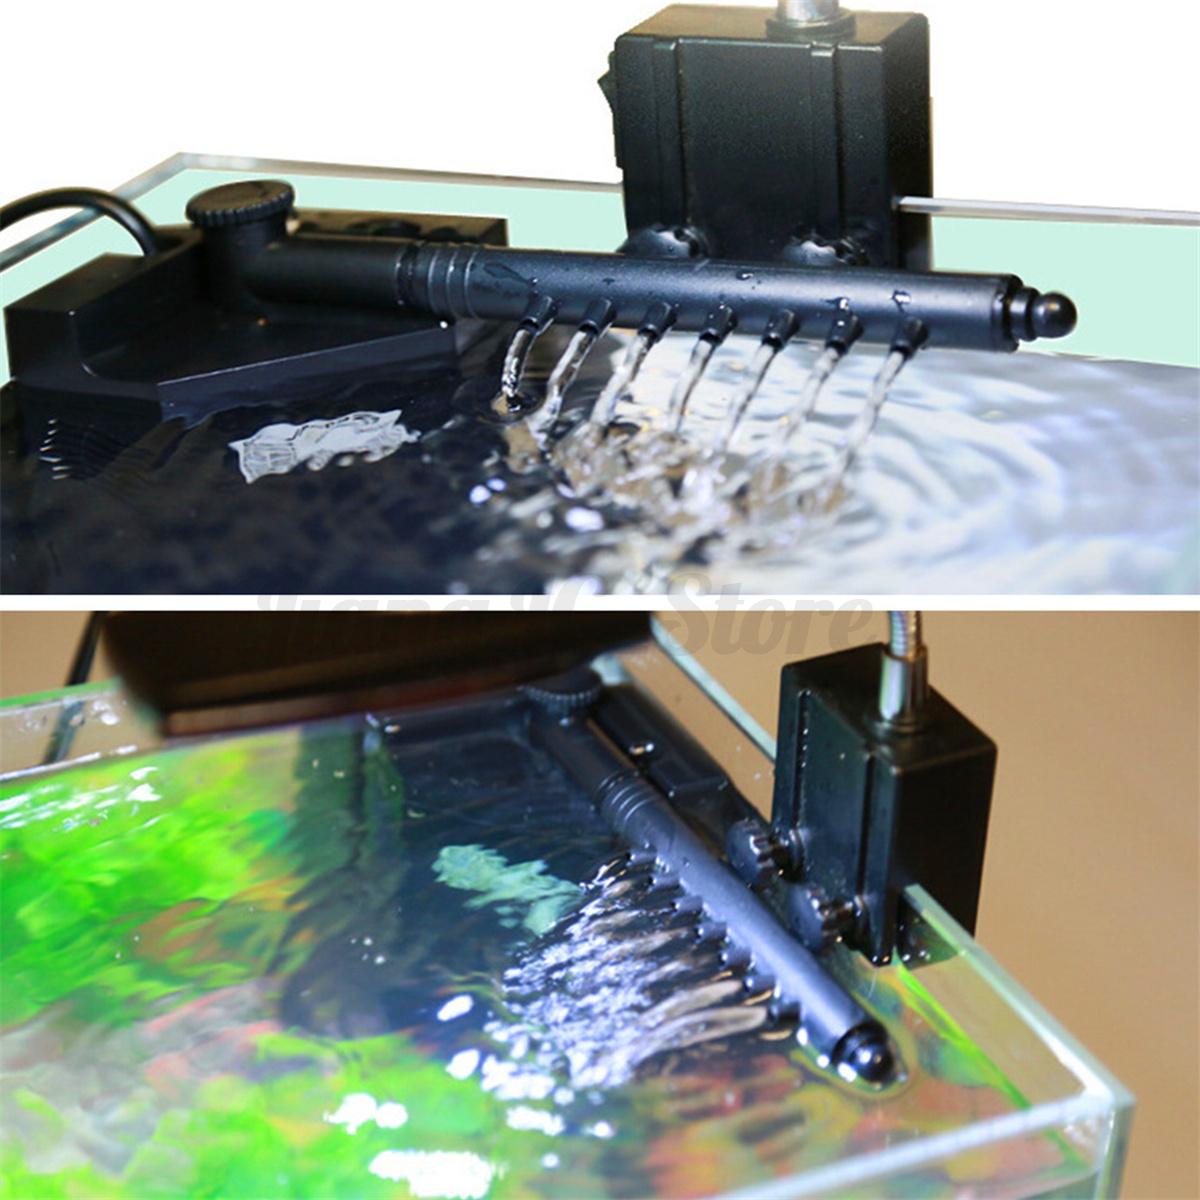 Aquarium internal corner fish tank filtration filter water for Water softener for fish tank